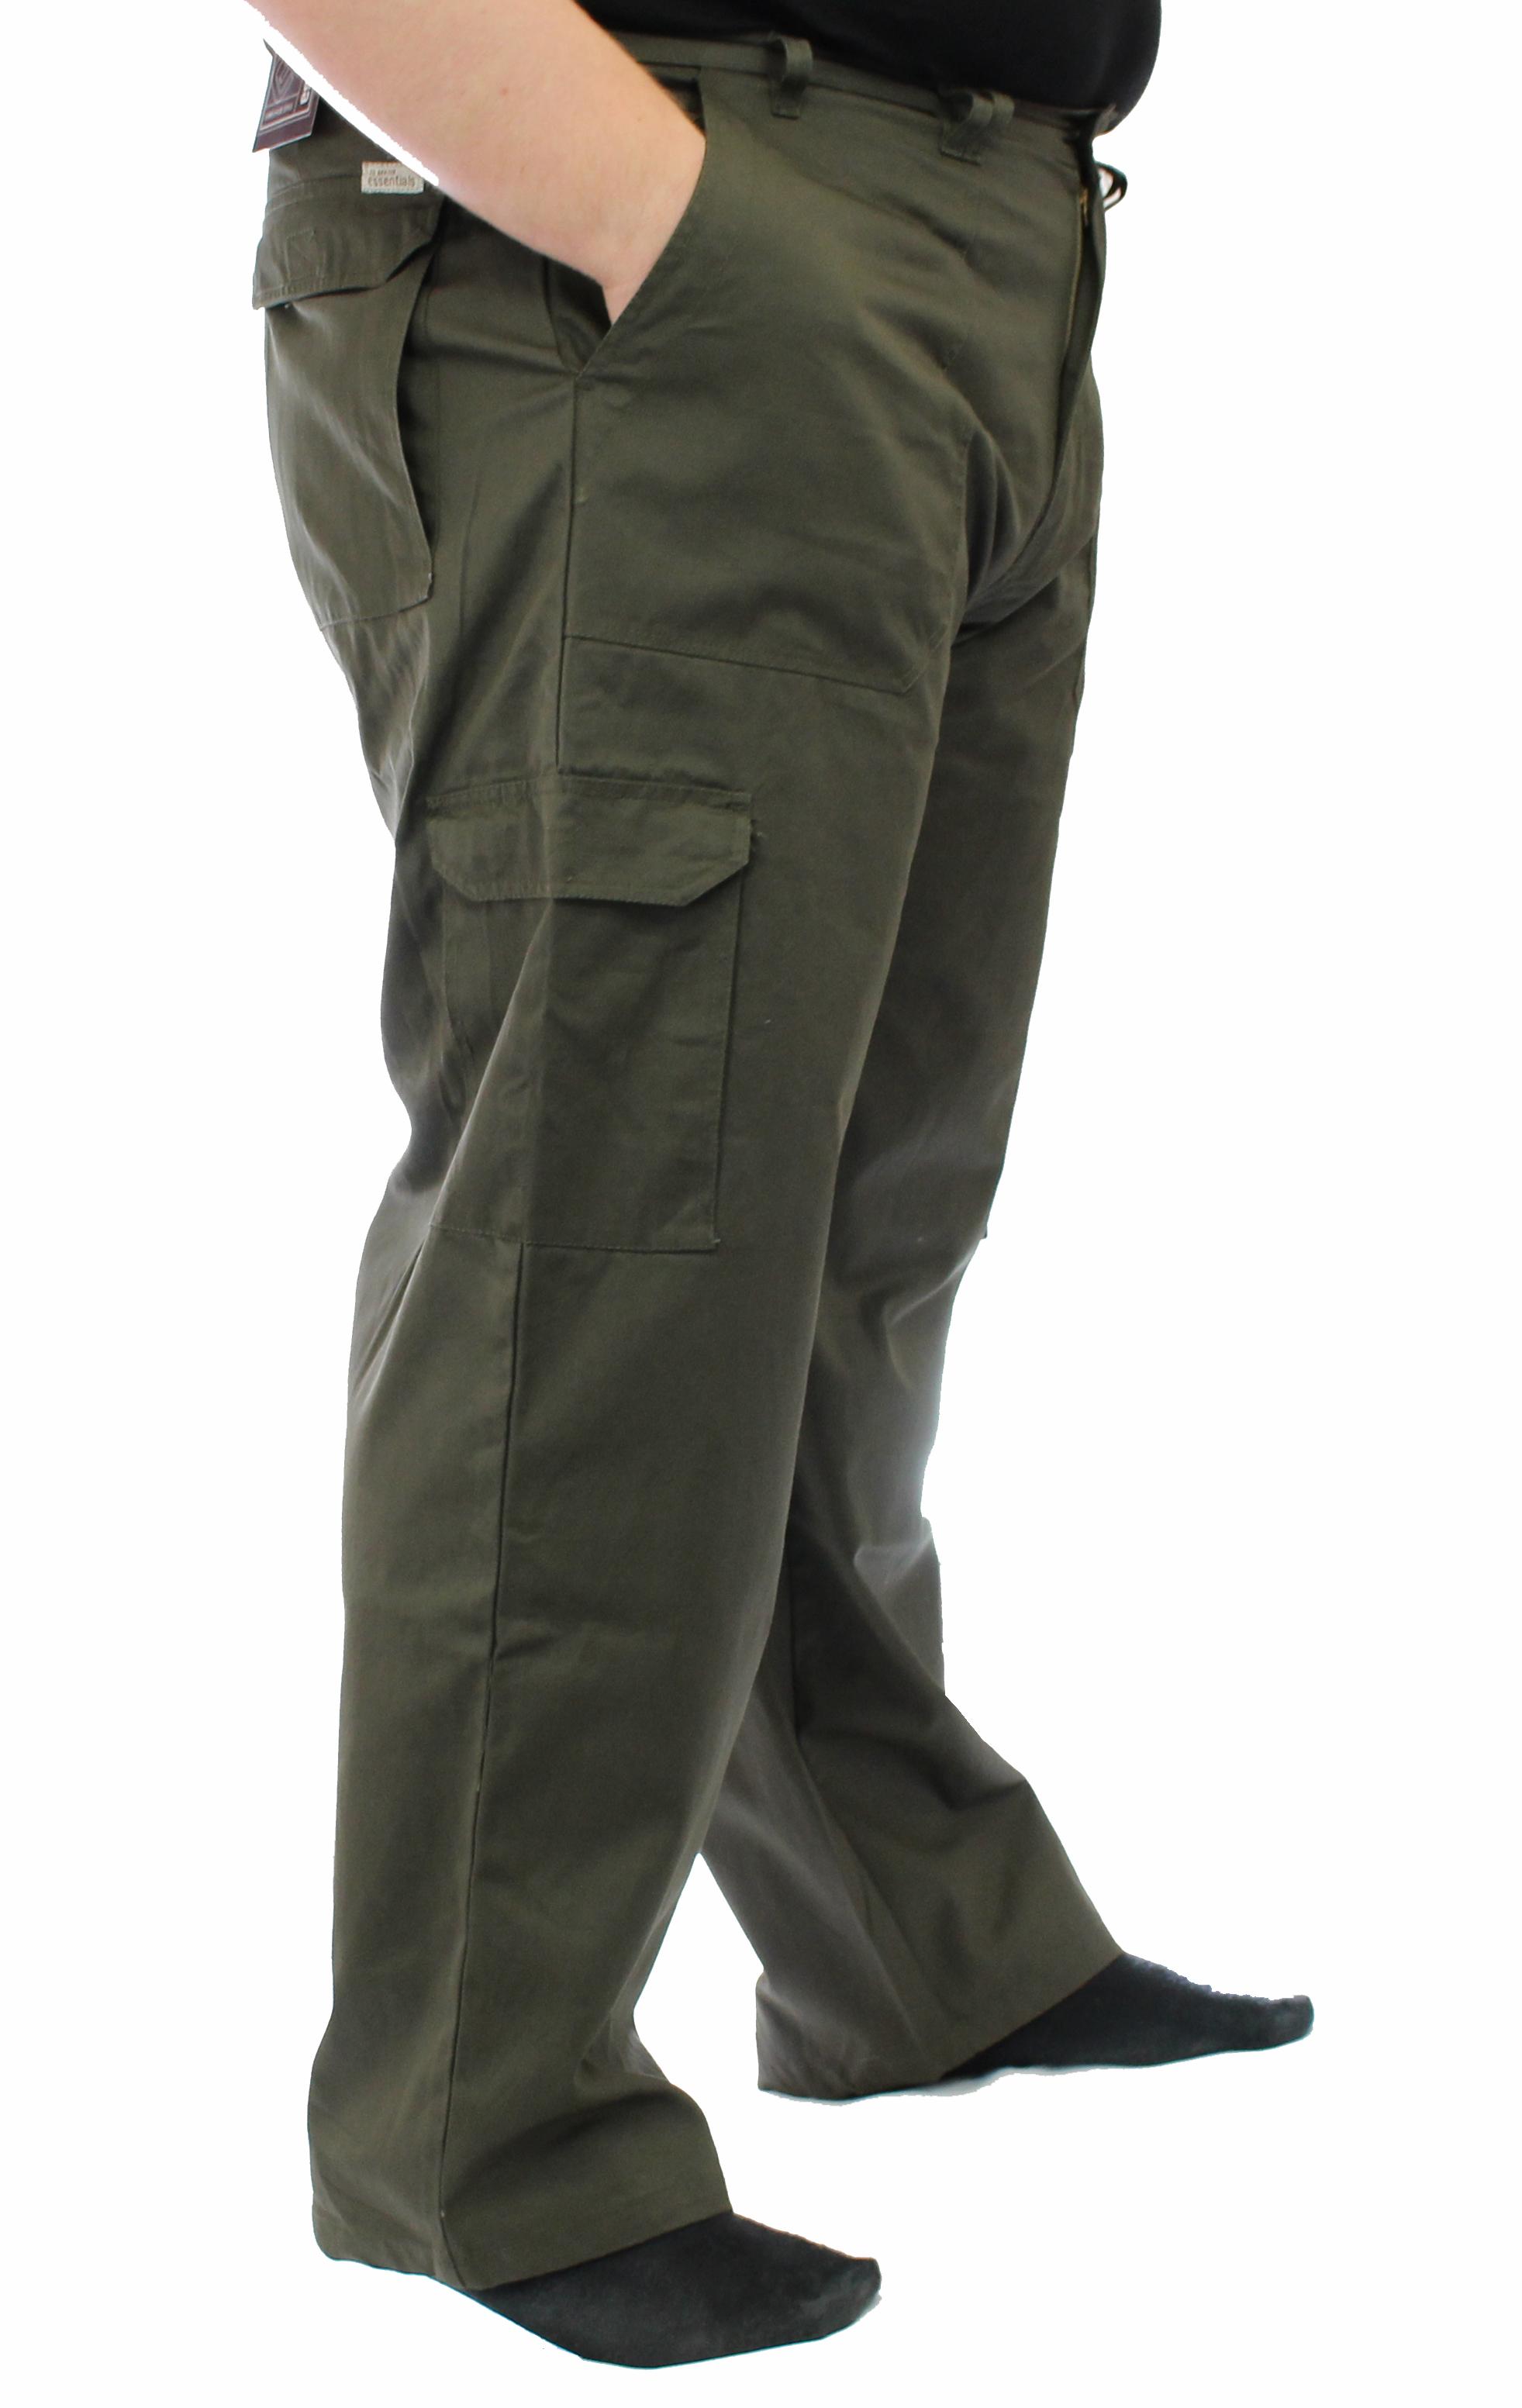 "Ed Baxter Victory - Heavy Duty Cargo Combat Trousers - Khaki - 58"" Waist, 30"" Leg"